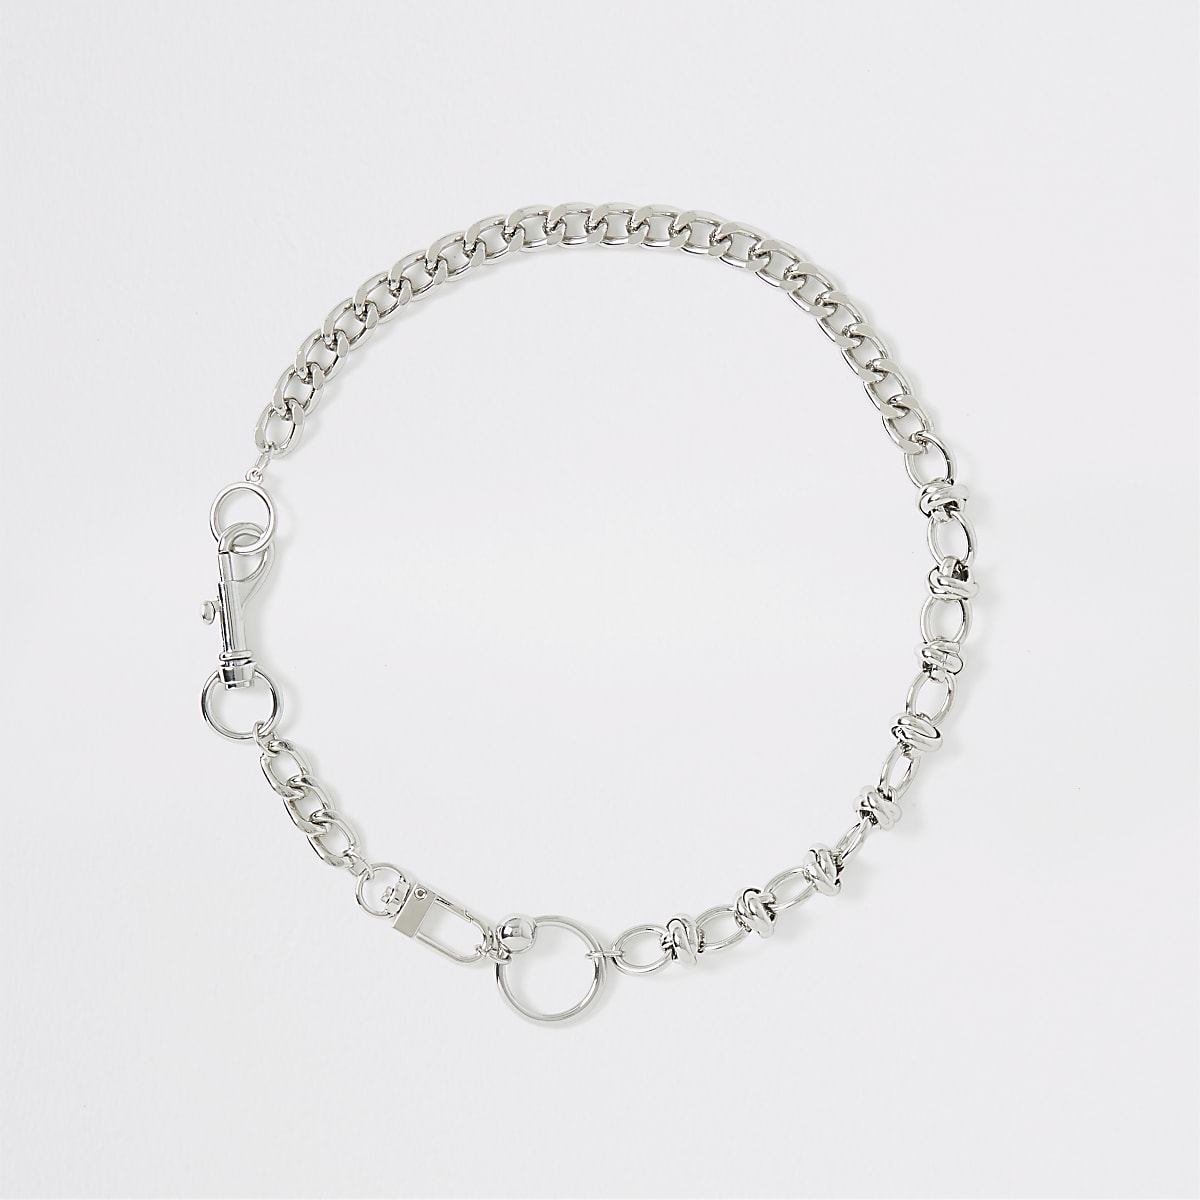 Silver colour chain necklace